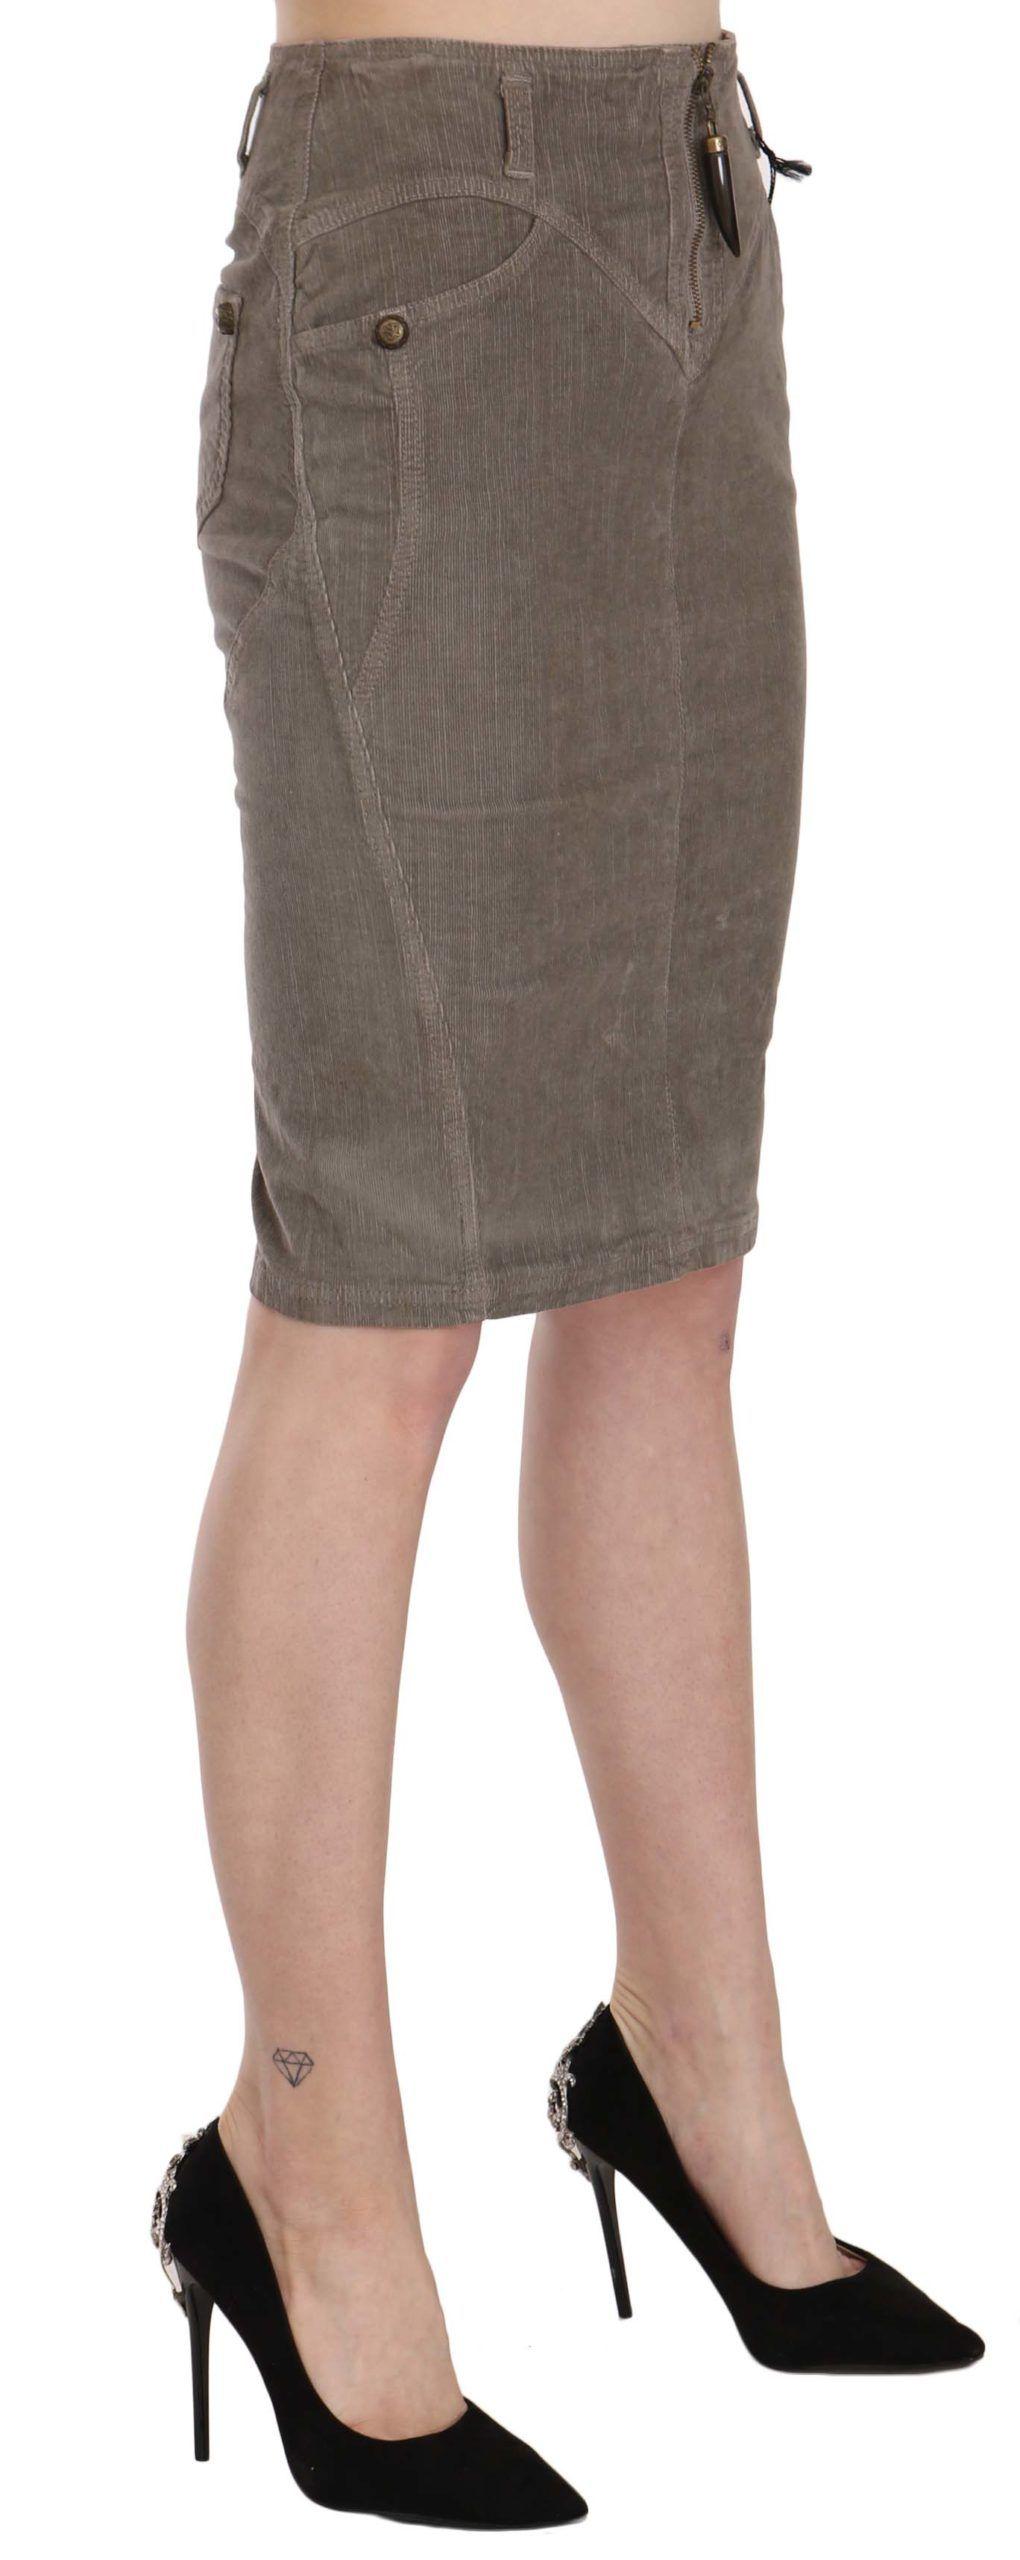 Just Cavalli Gray Corduroy Pencil Straight A-Line Skirt